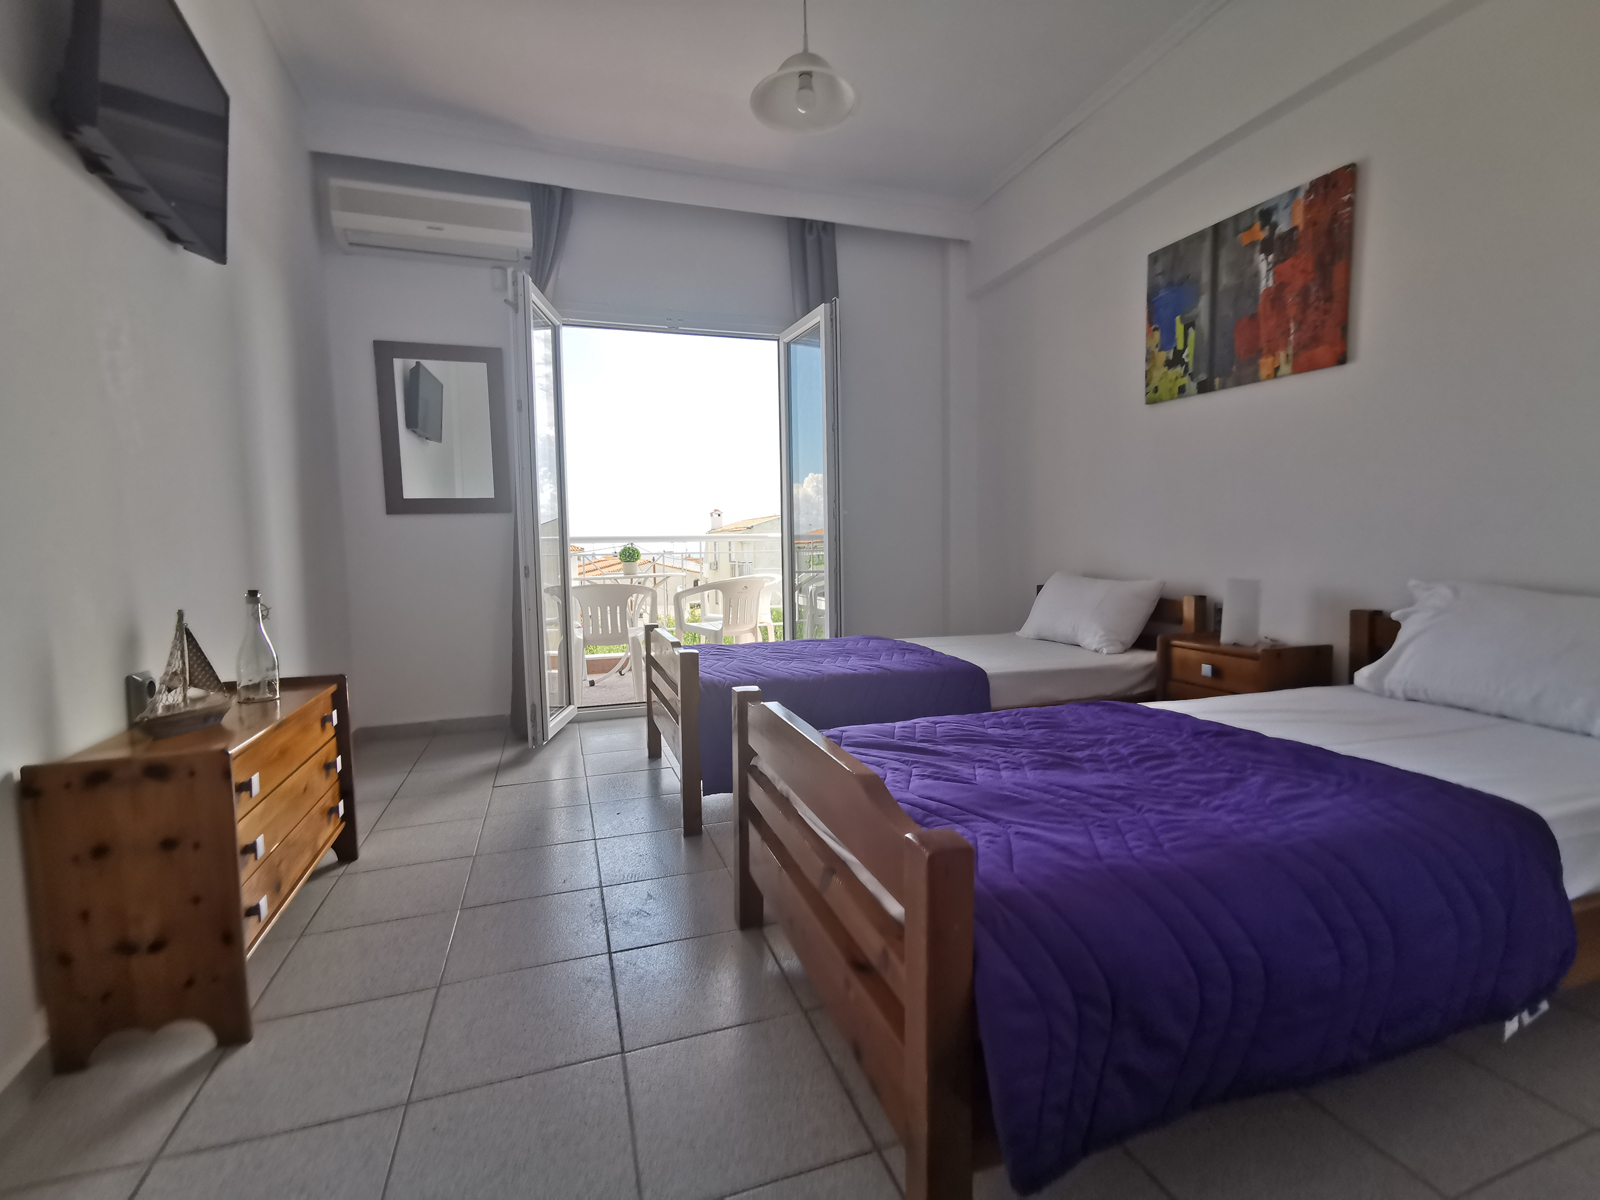 Grcka apartmani letovanje, Polihrono Halkidiki, Green Gardens, izgled apartmana